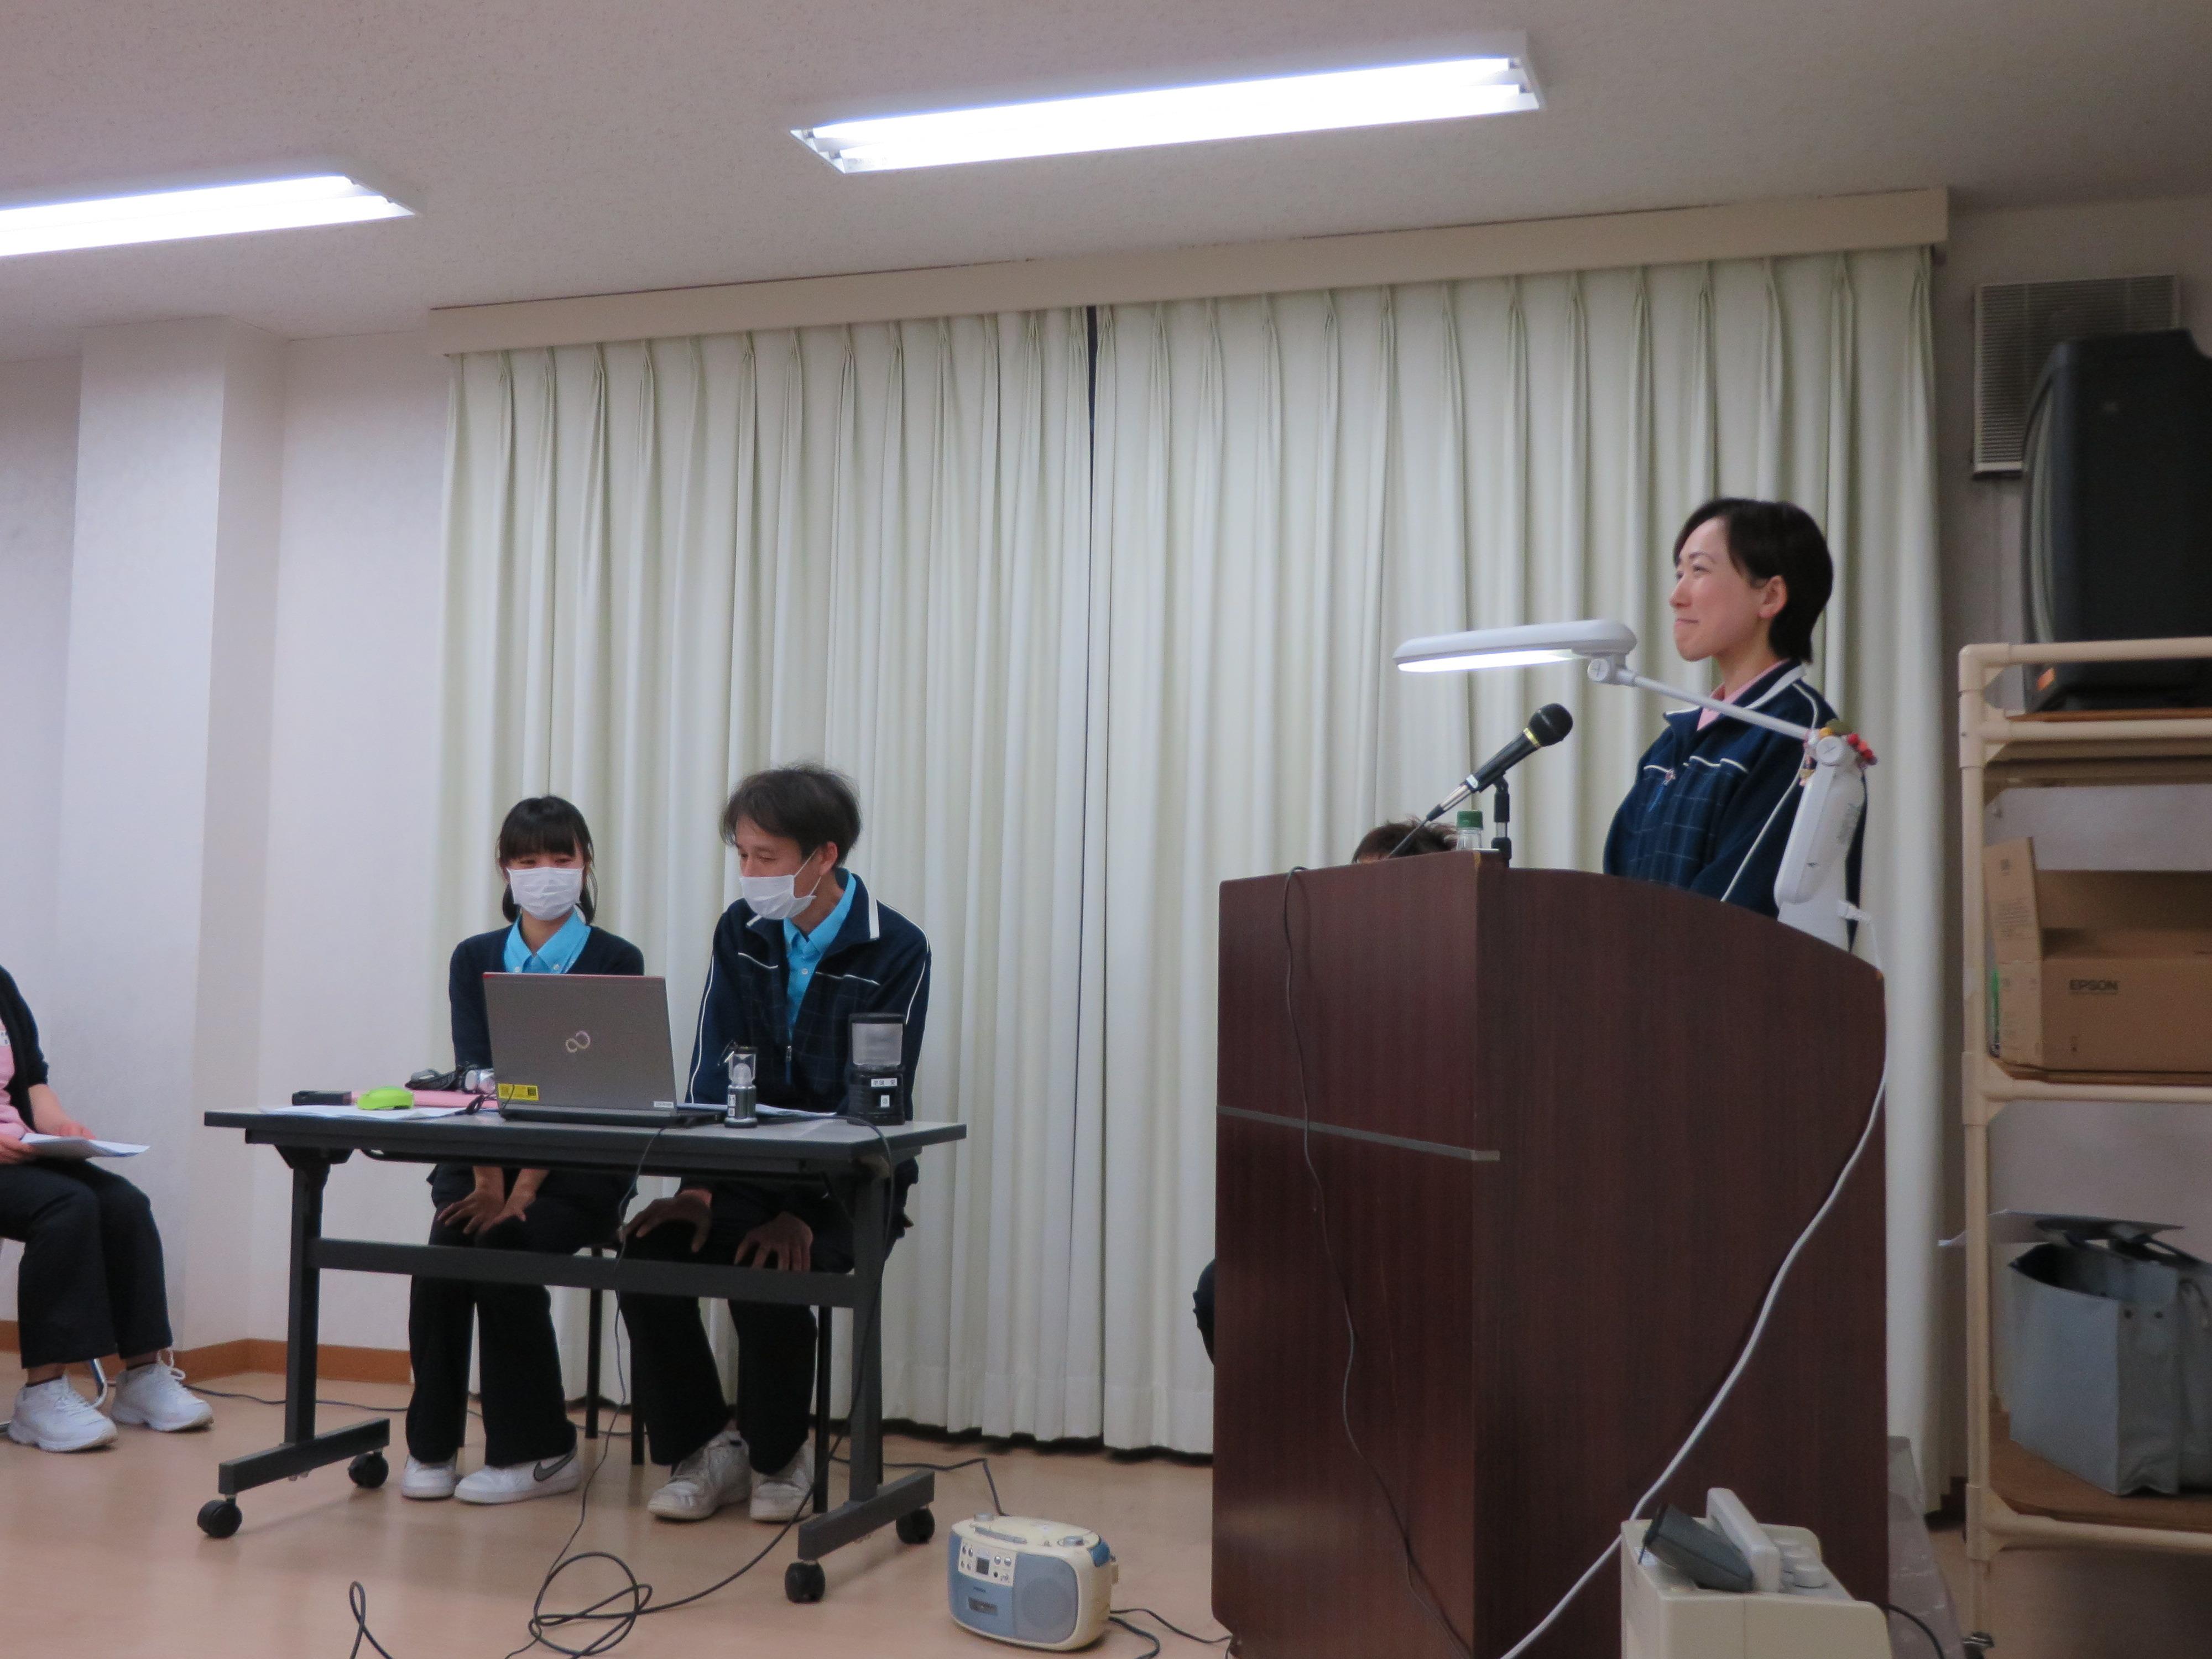 IMG_0066.JPG